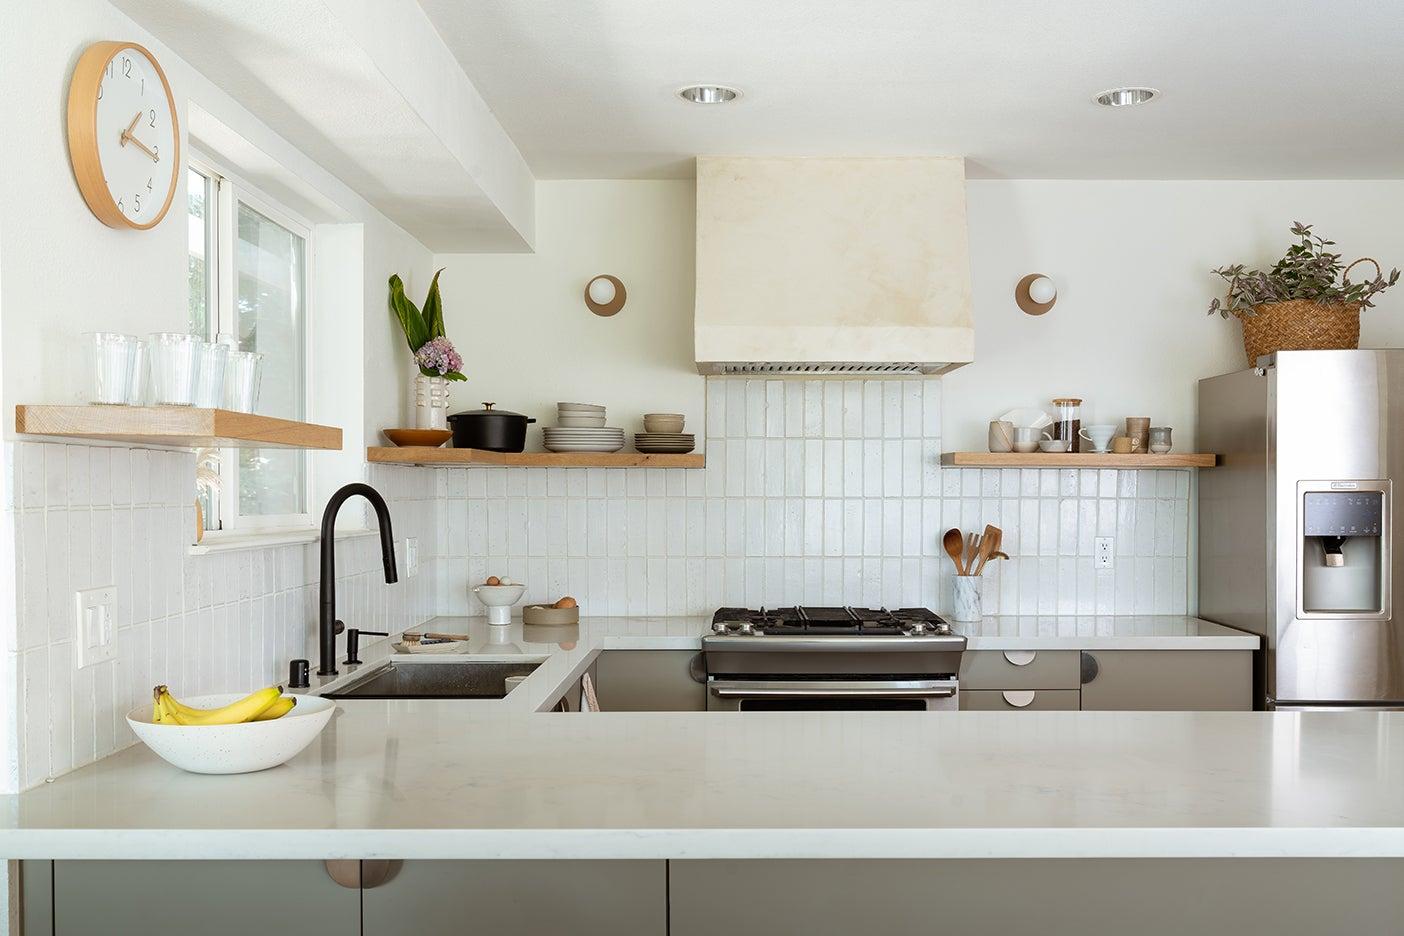 white subway tile backsplash and plaster oven hood